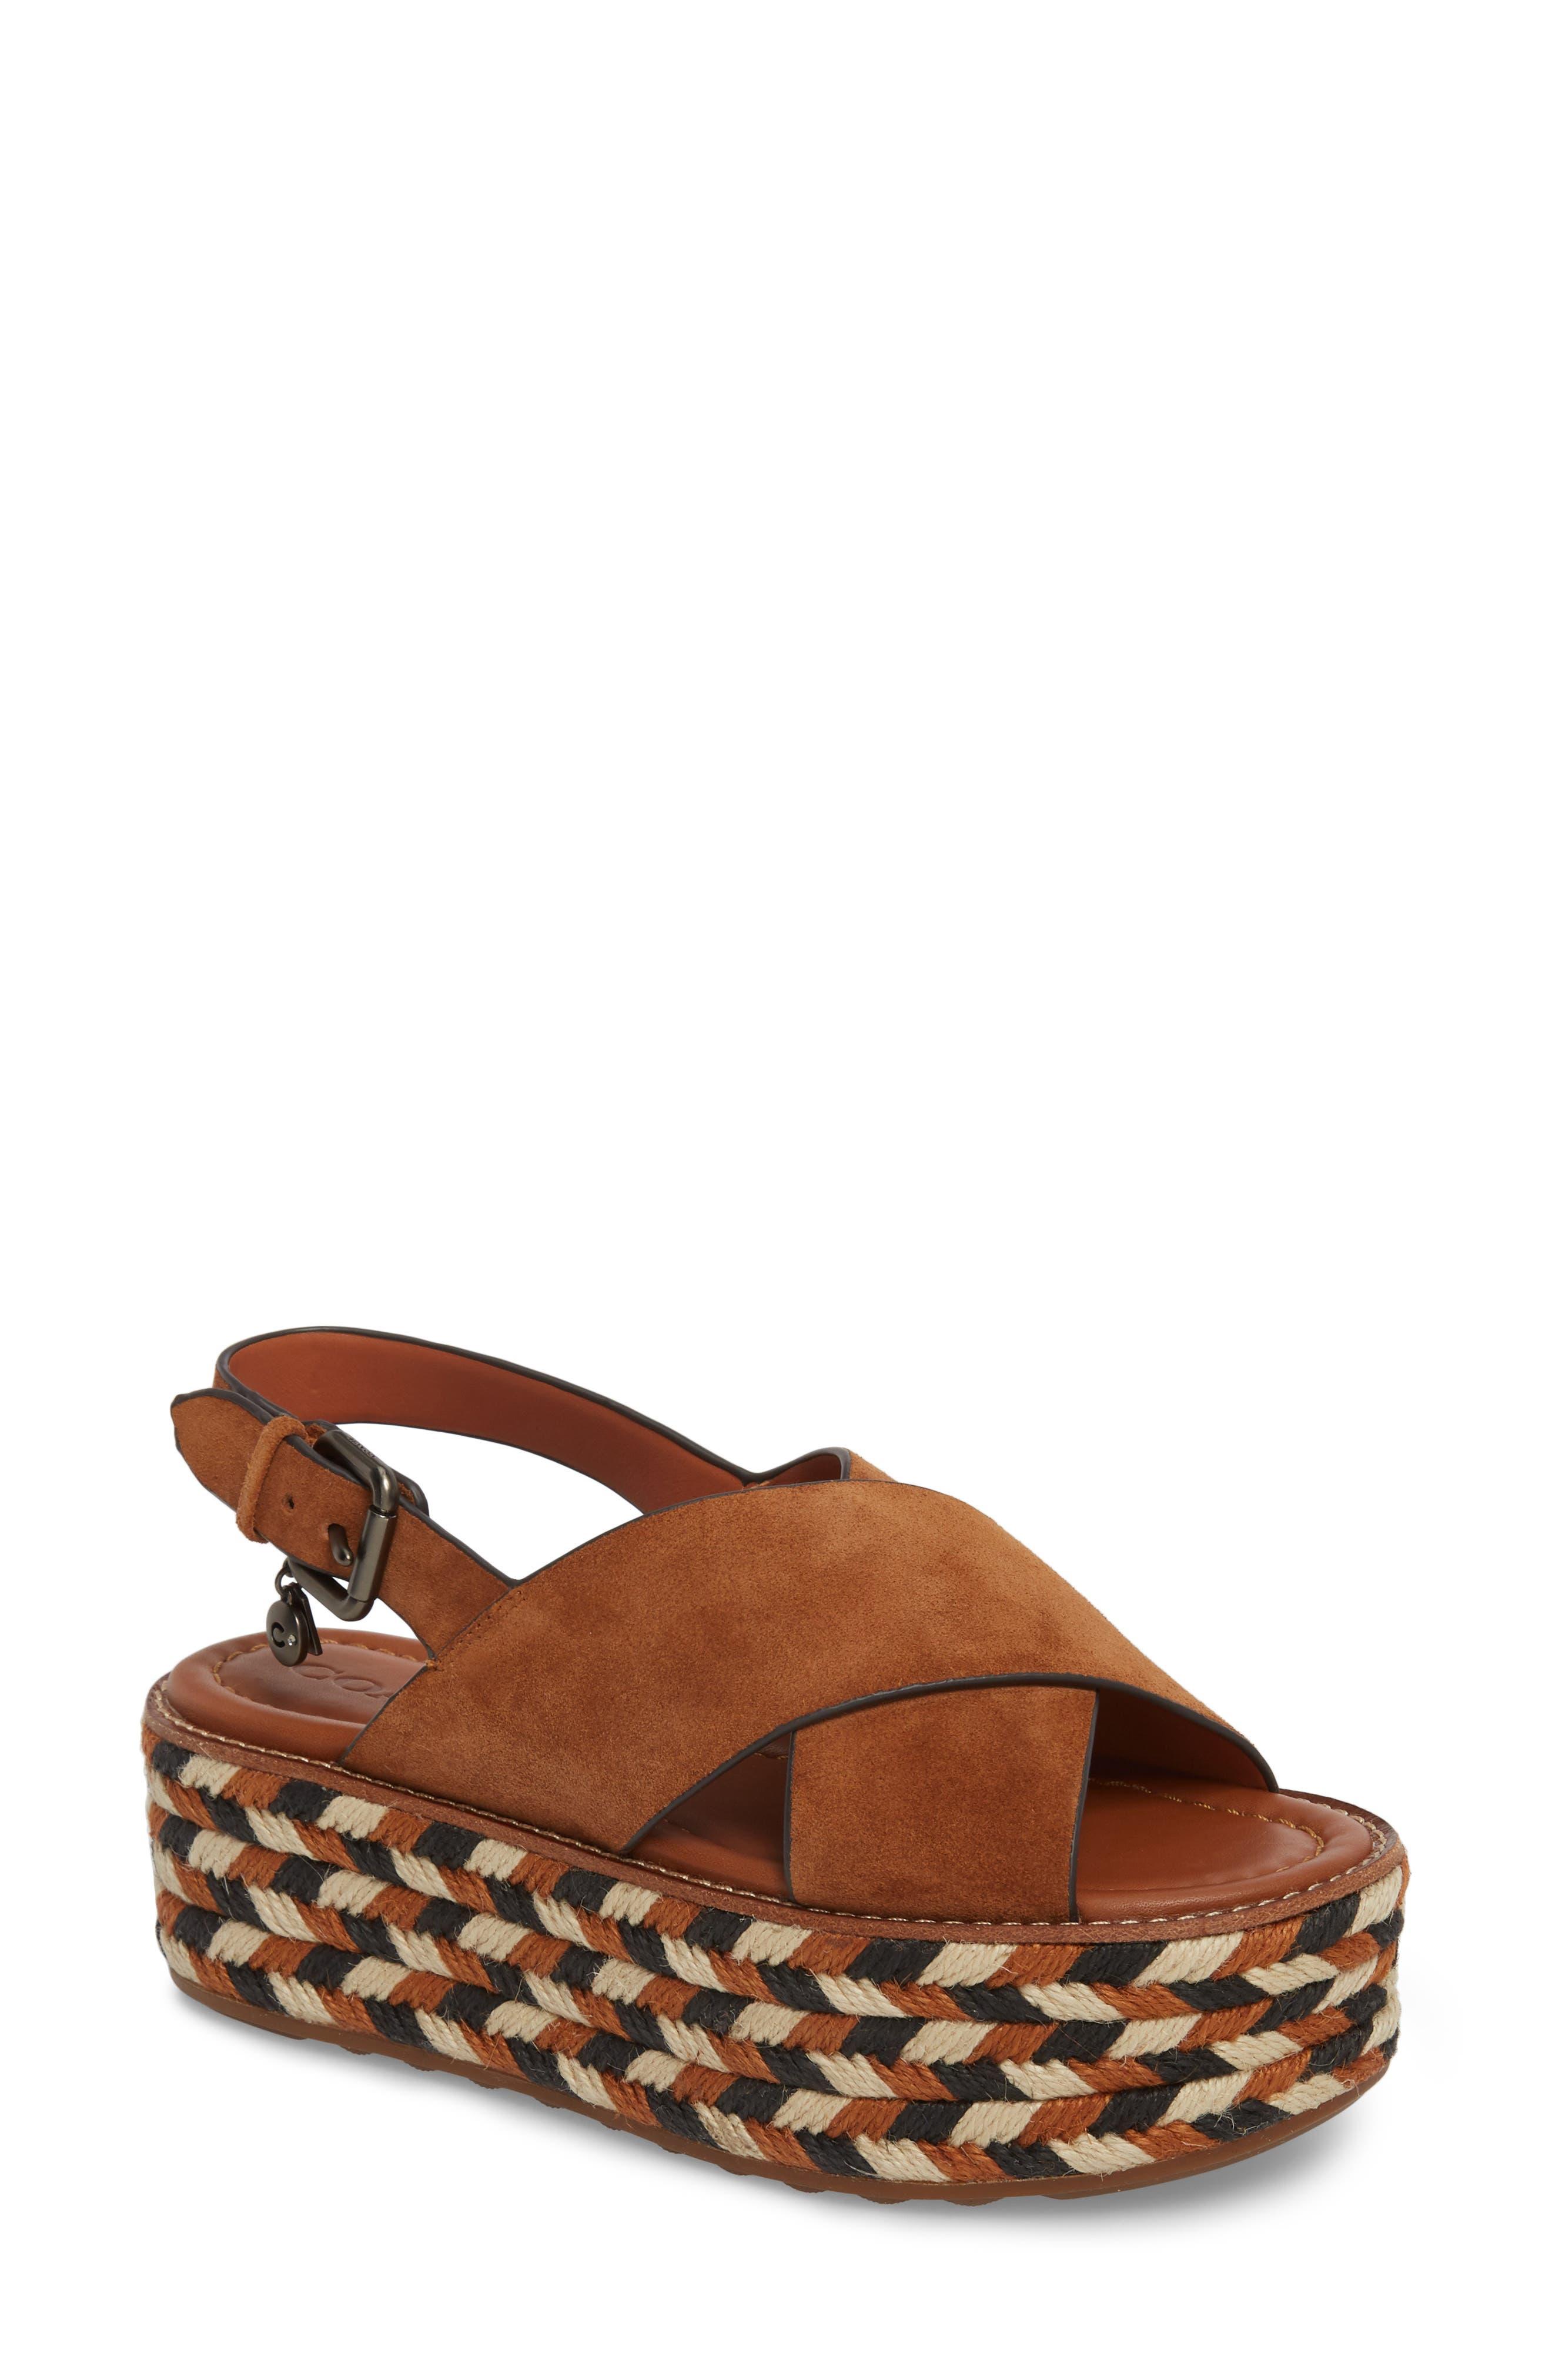 COACH Platform Wedge Sandal (Women)